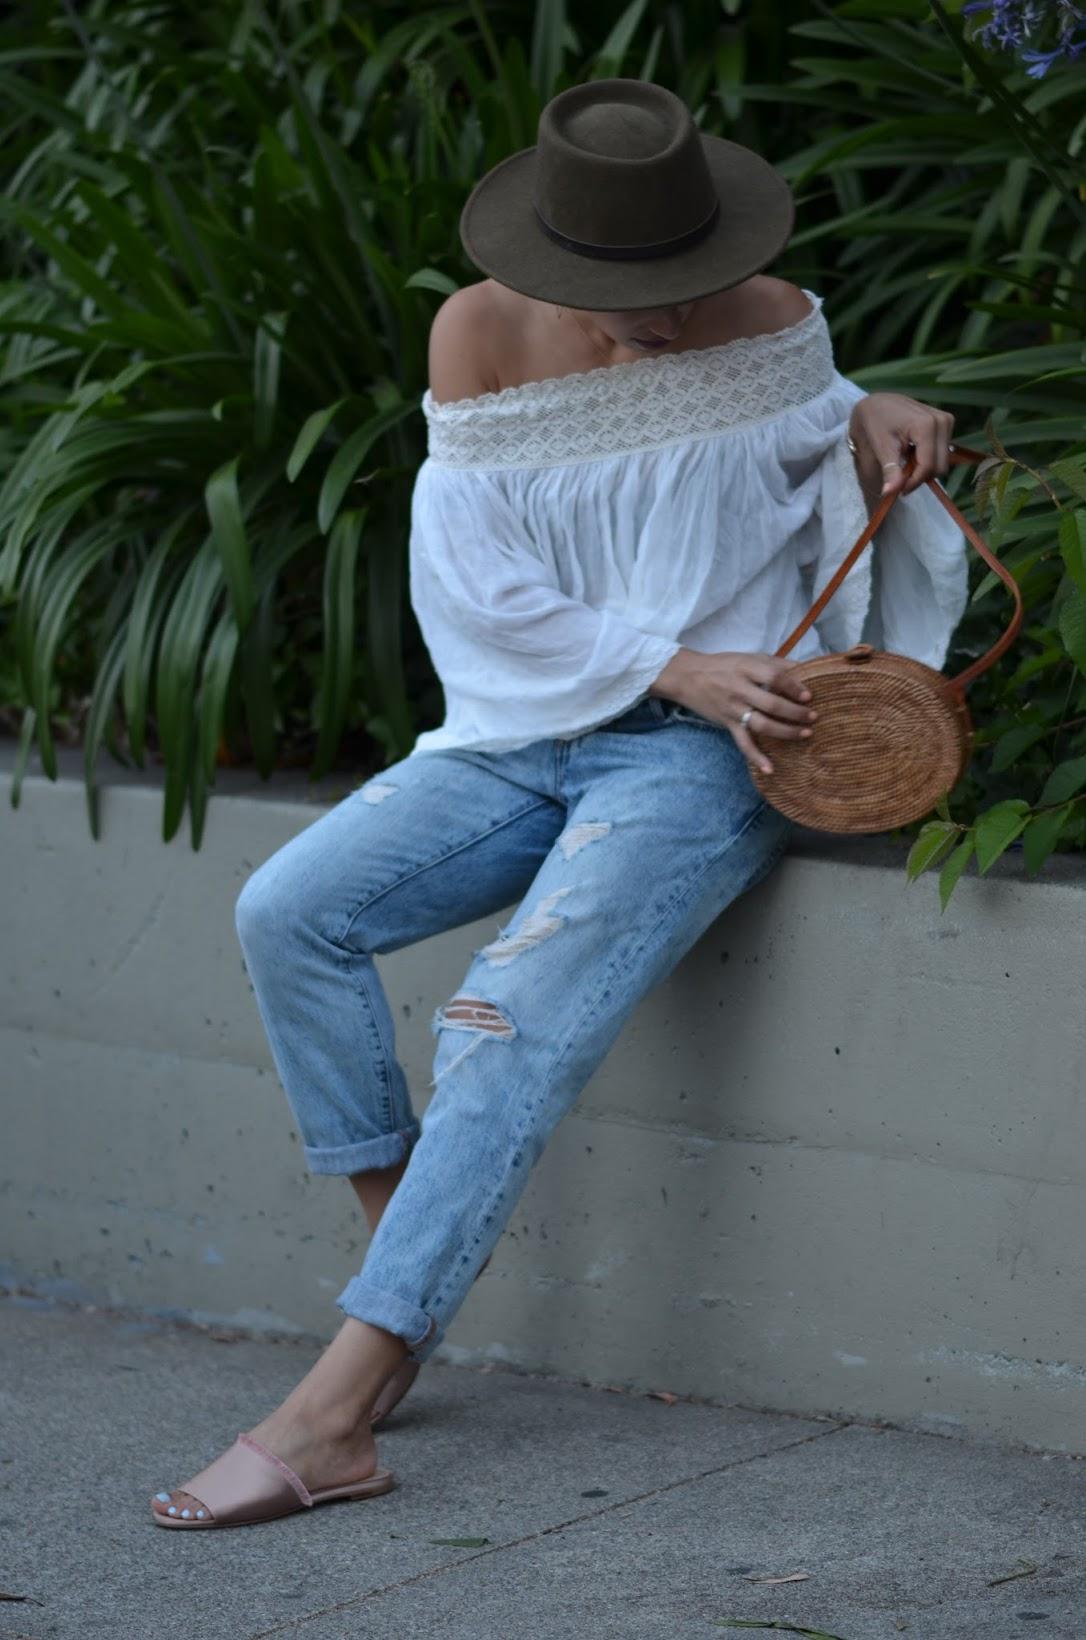 M. Gemi Tenidas, off the shoulder linen top, straw bag from Bali, round straw bag, Levi's 501